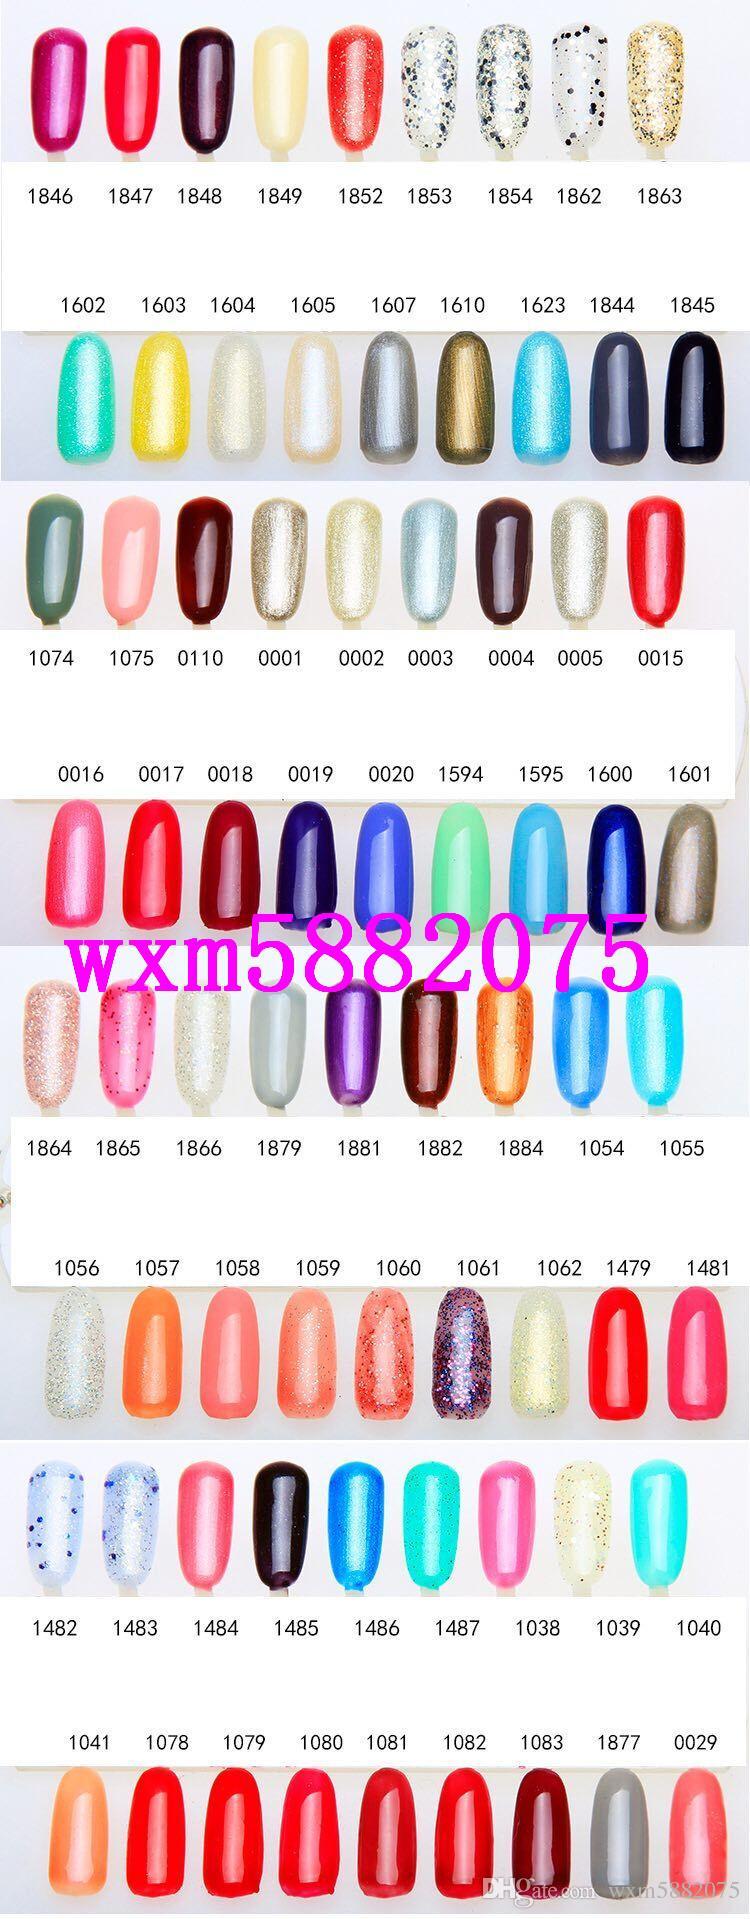 nuevo es Harmony Gelish Nail Polish ESTRUCURE GEL Soak off Clear Nail gel LED UV Gel Polish SUPERIOR Foundation nail art frence nail